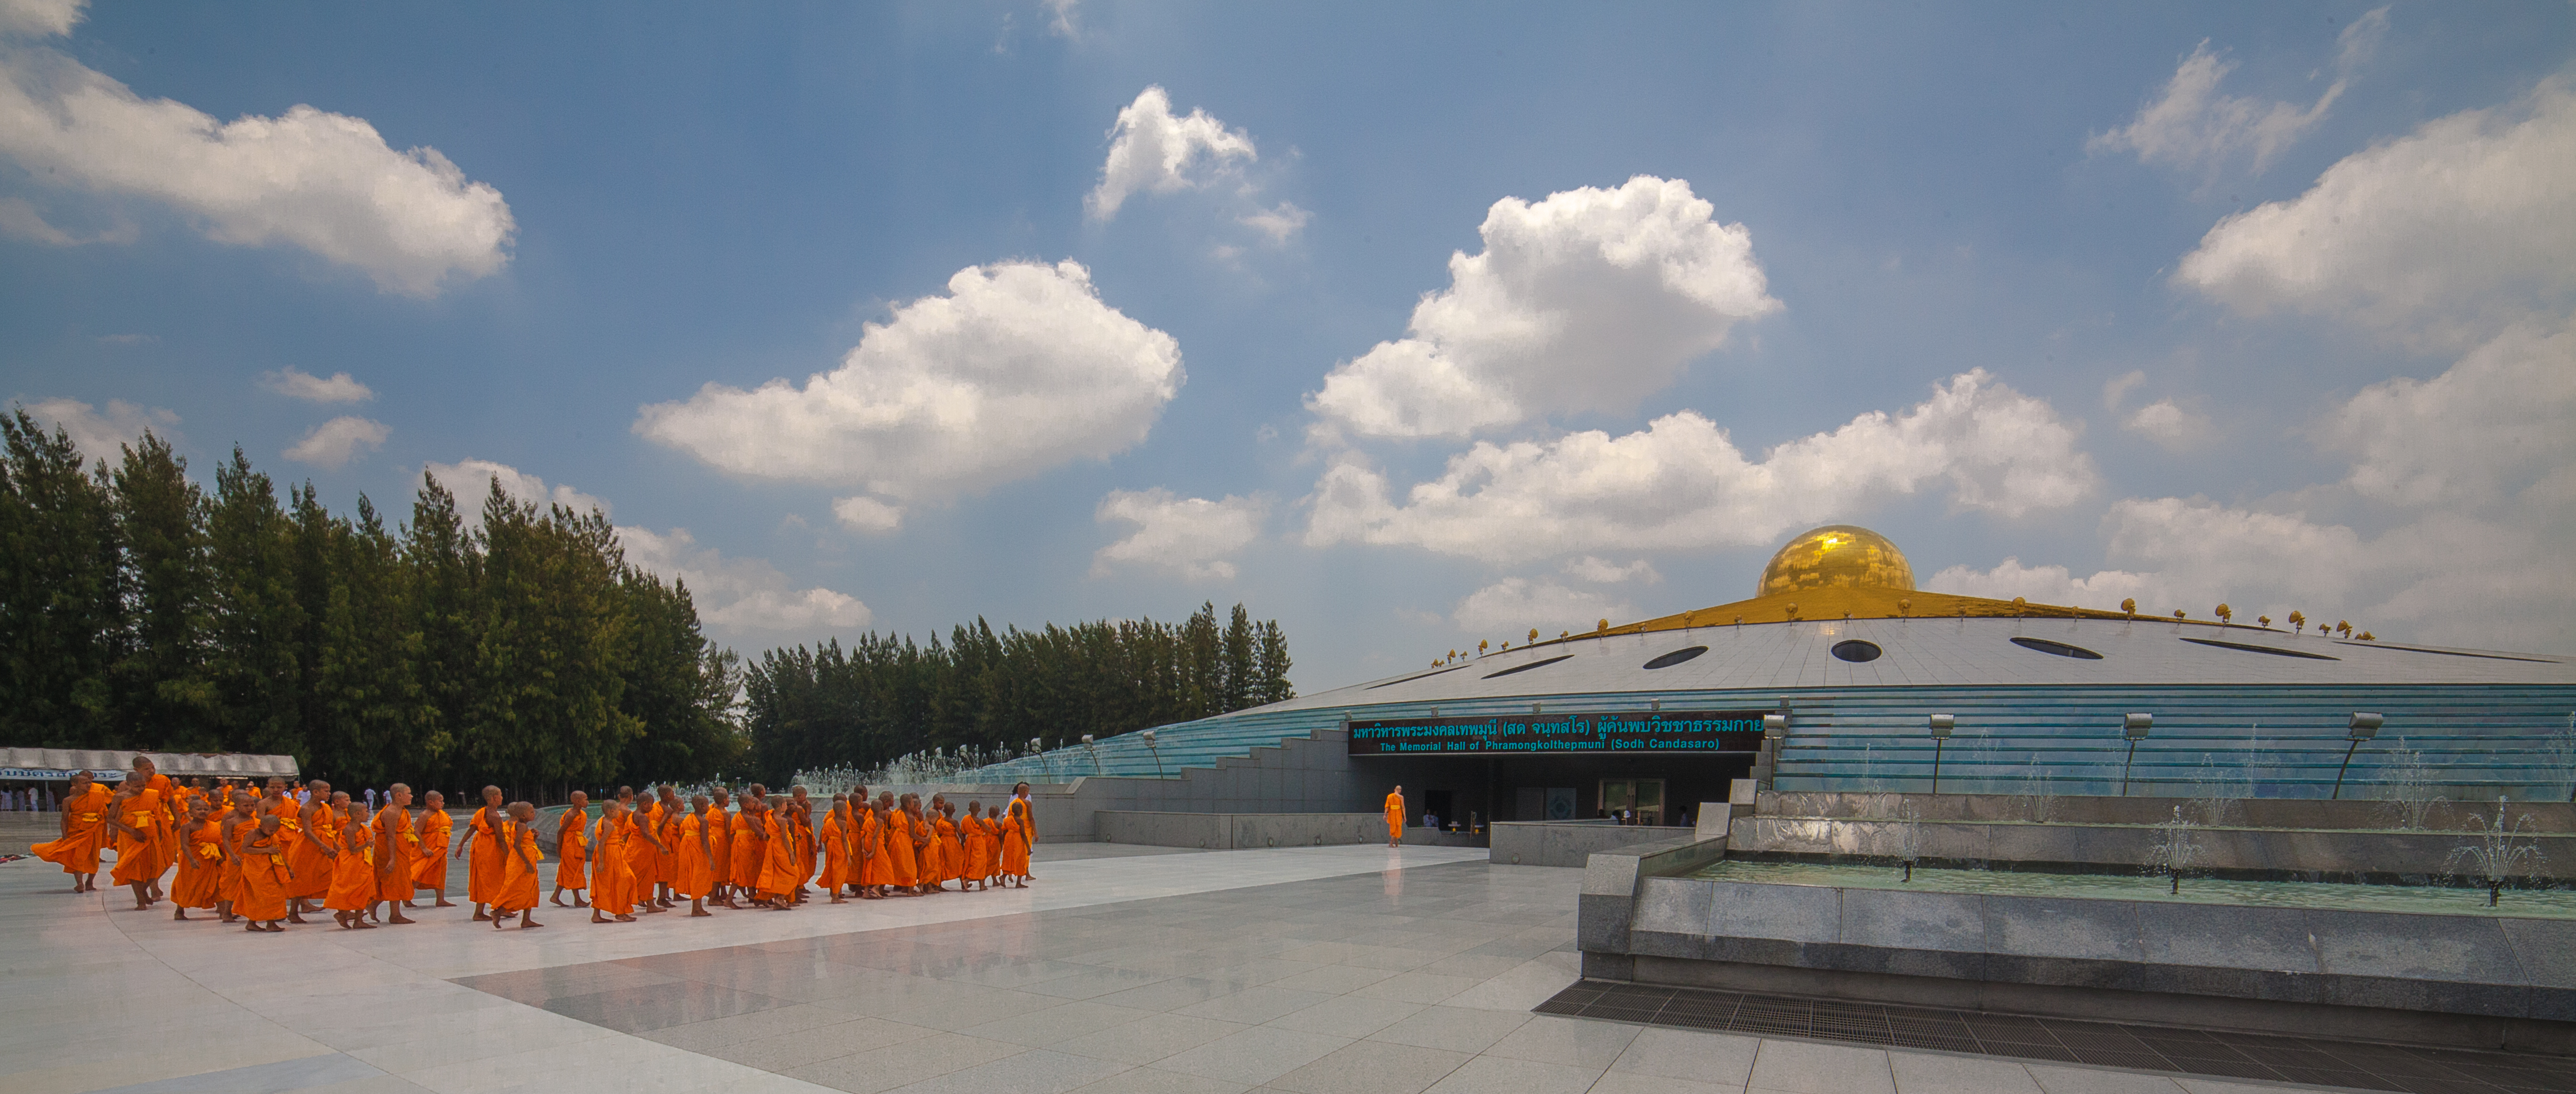 (2015) Bangkok Dhammakaya Temple